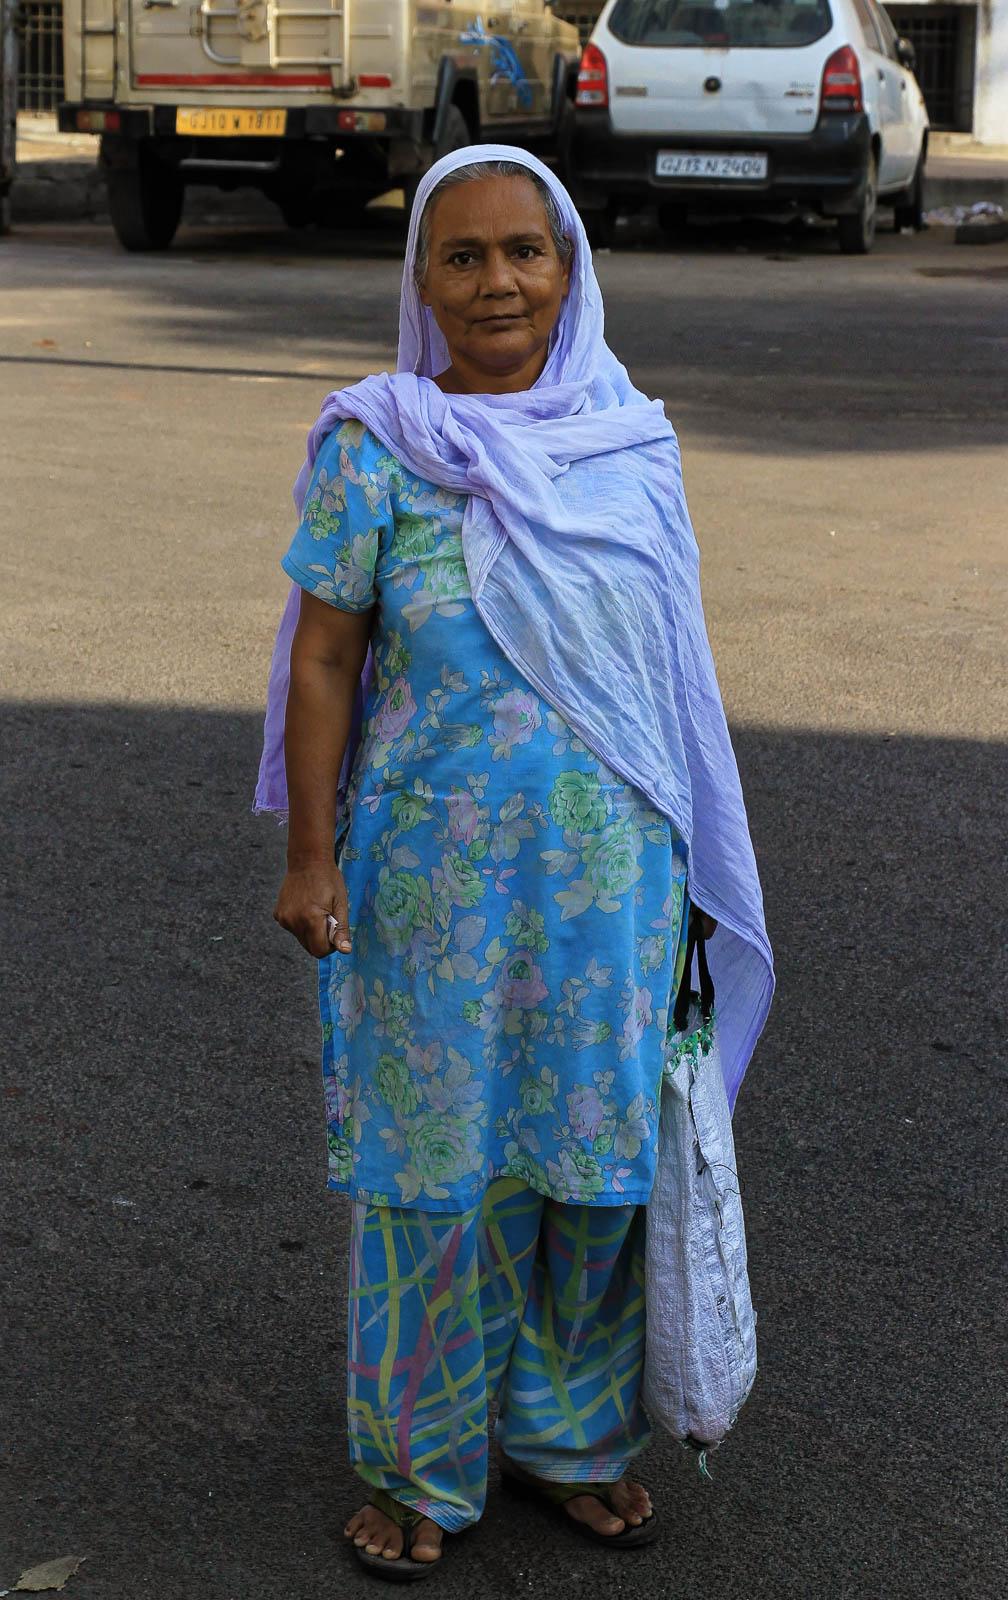 1031_Jamnagar_Shantinath-et-Adinath-Mandir-14.jpg